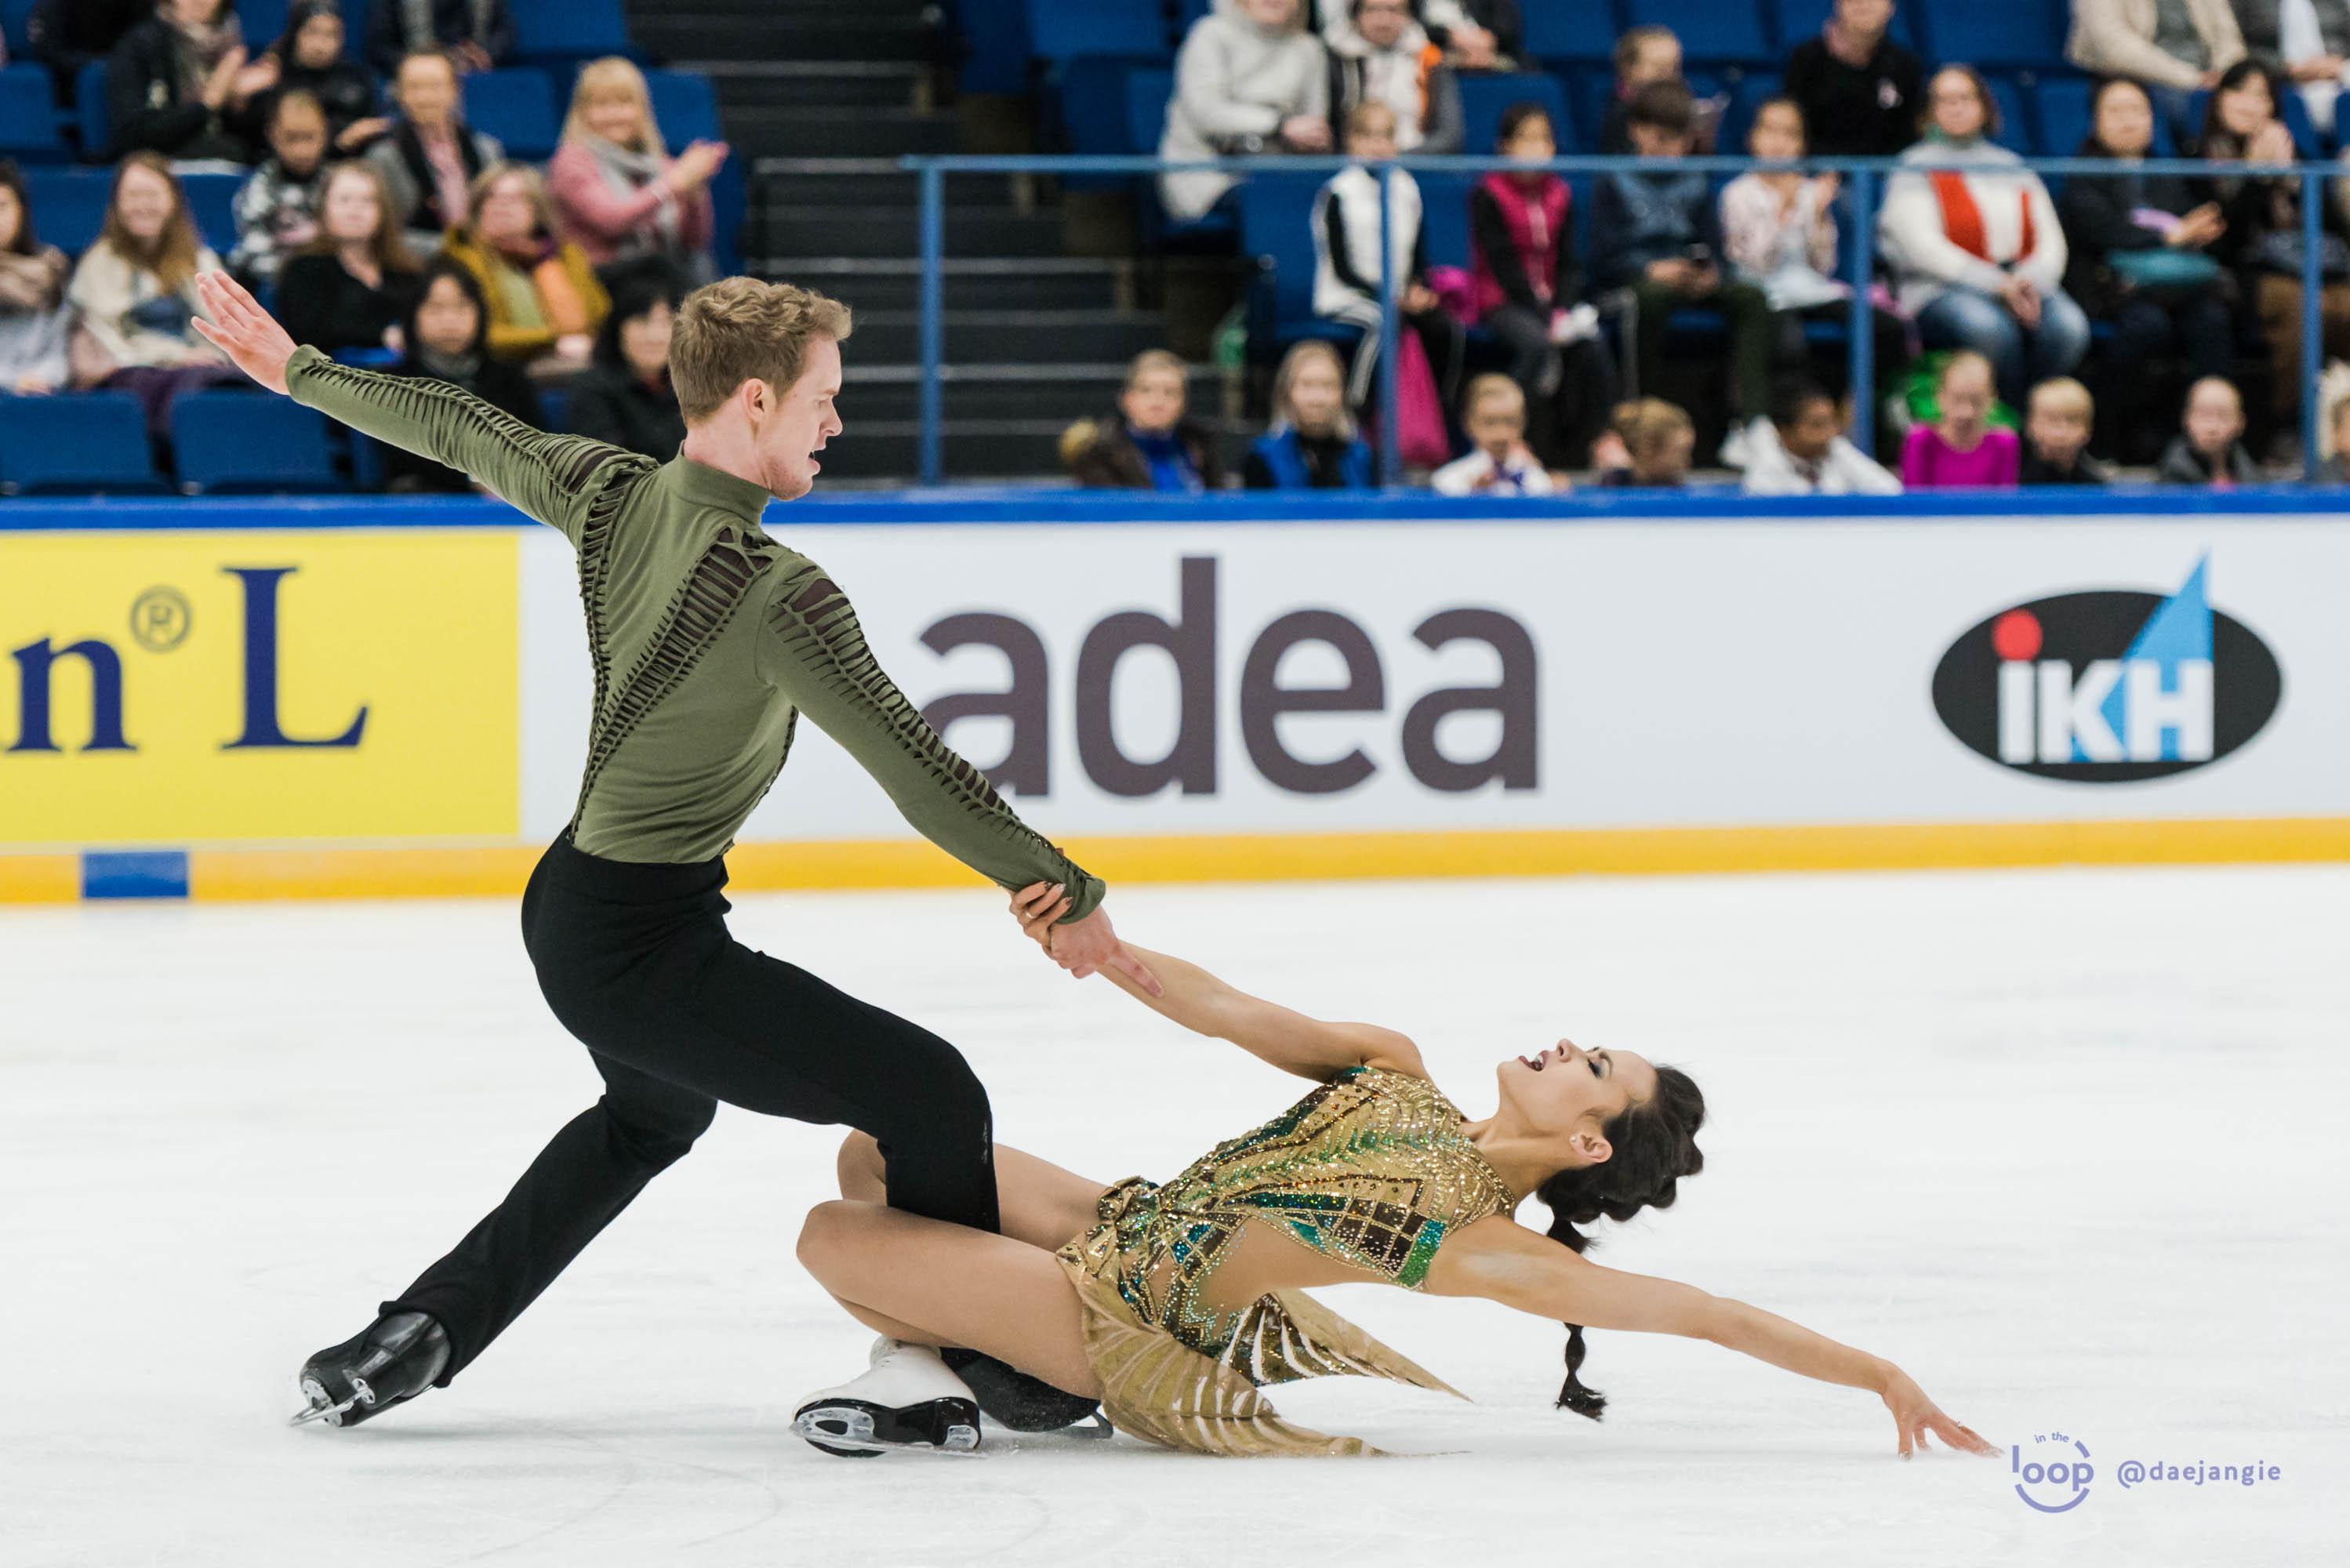 Challenger (6) - Finlandia Trophy. Oct 11 - 13, 2019. Espoo /FIN      - Страница 13 EG3MAiDWsAAqBSw?format=jpg&name=4096x4096